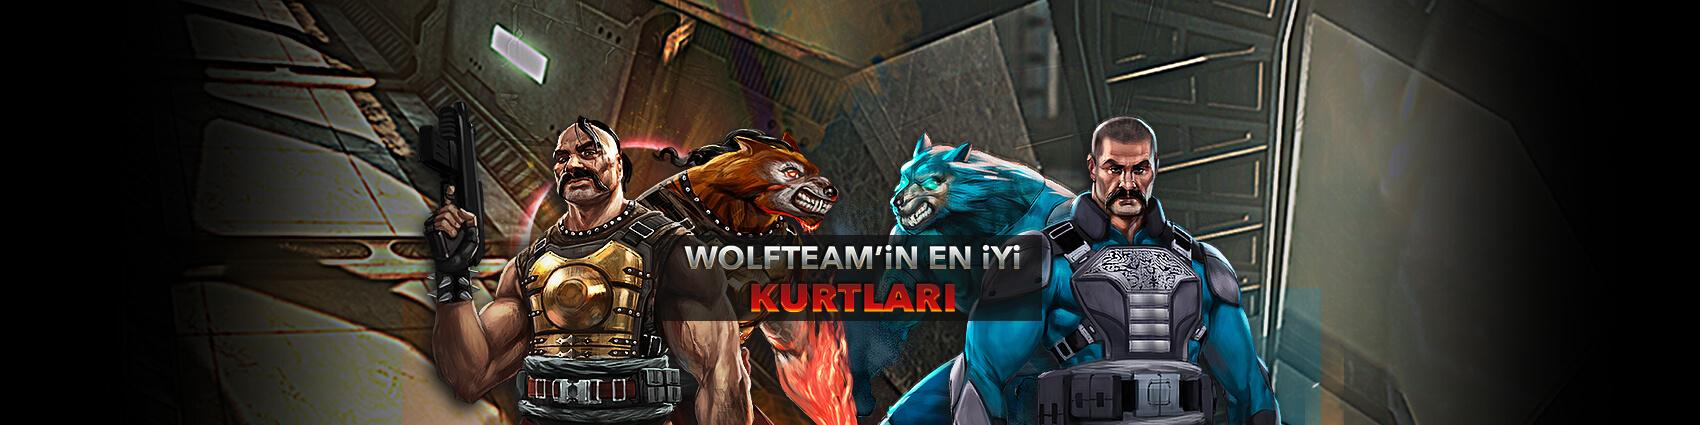 Wolfteam'de Ateş ve Barut Zamanı